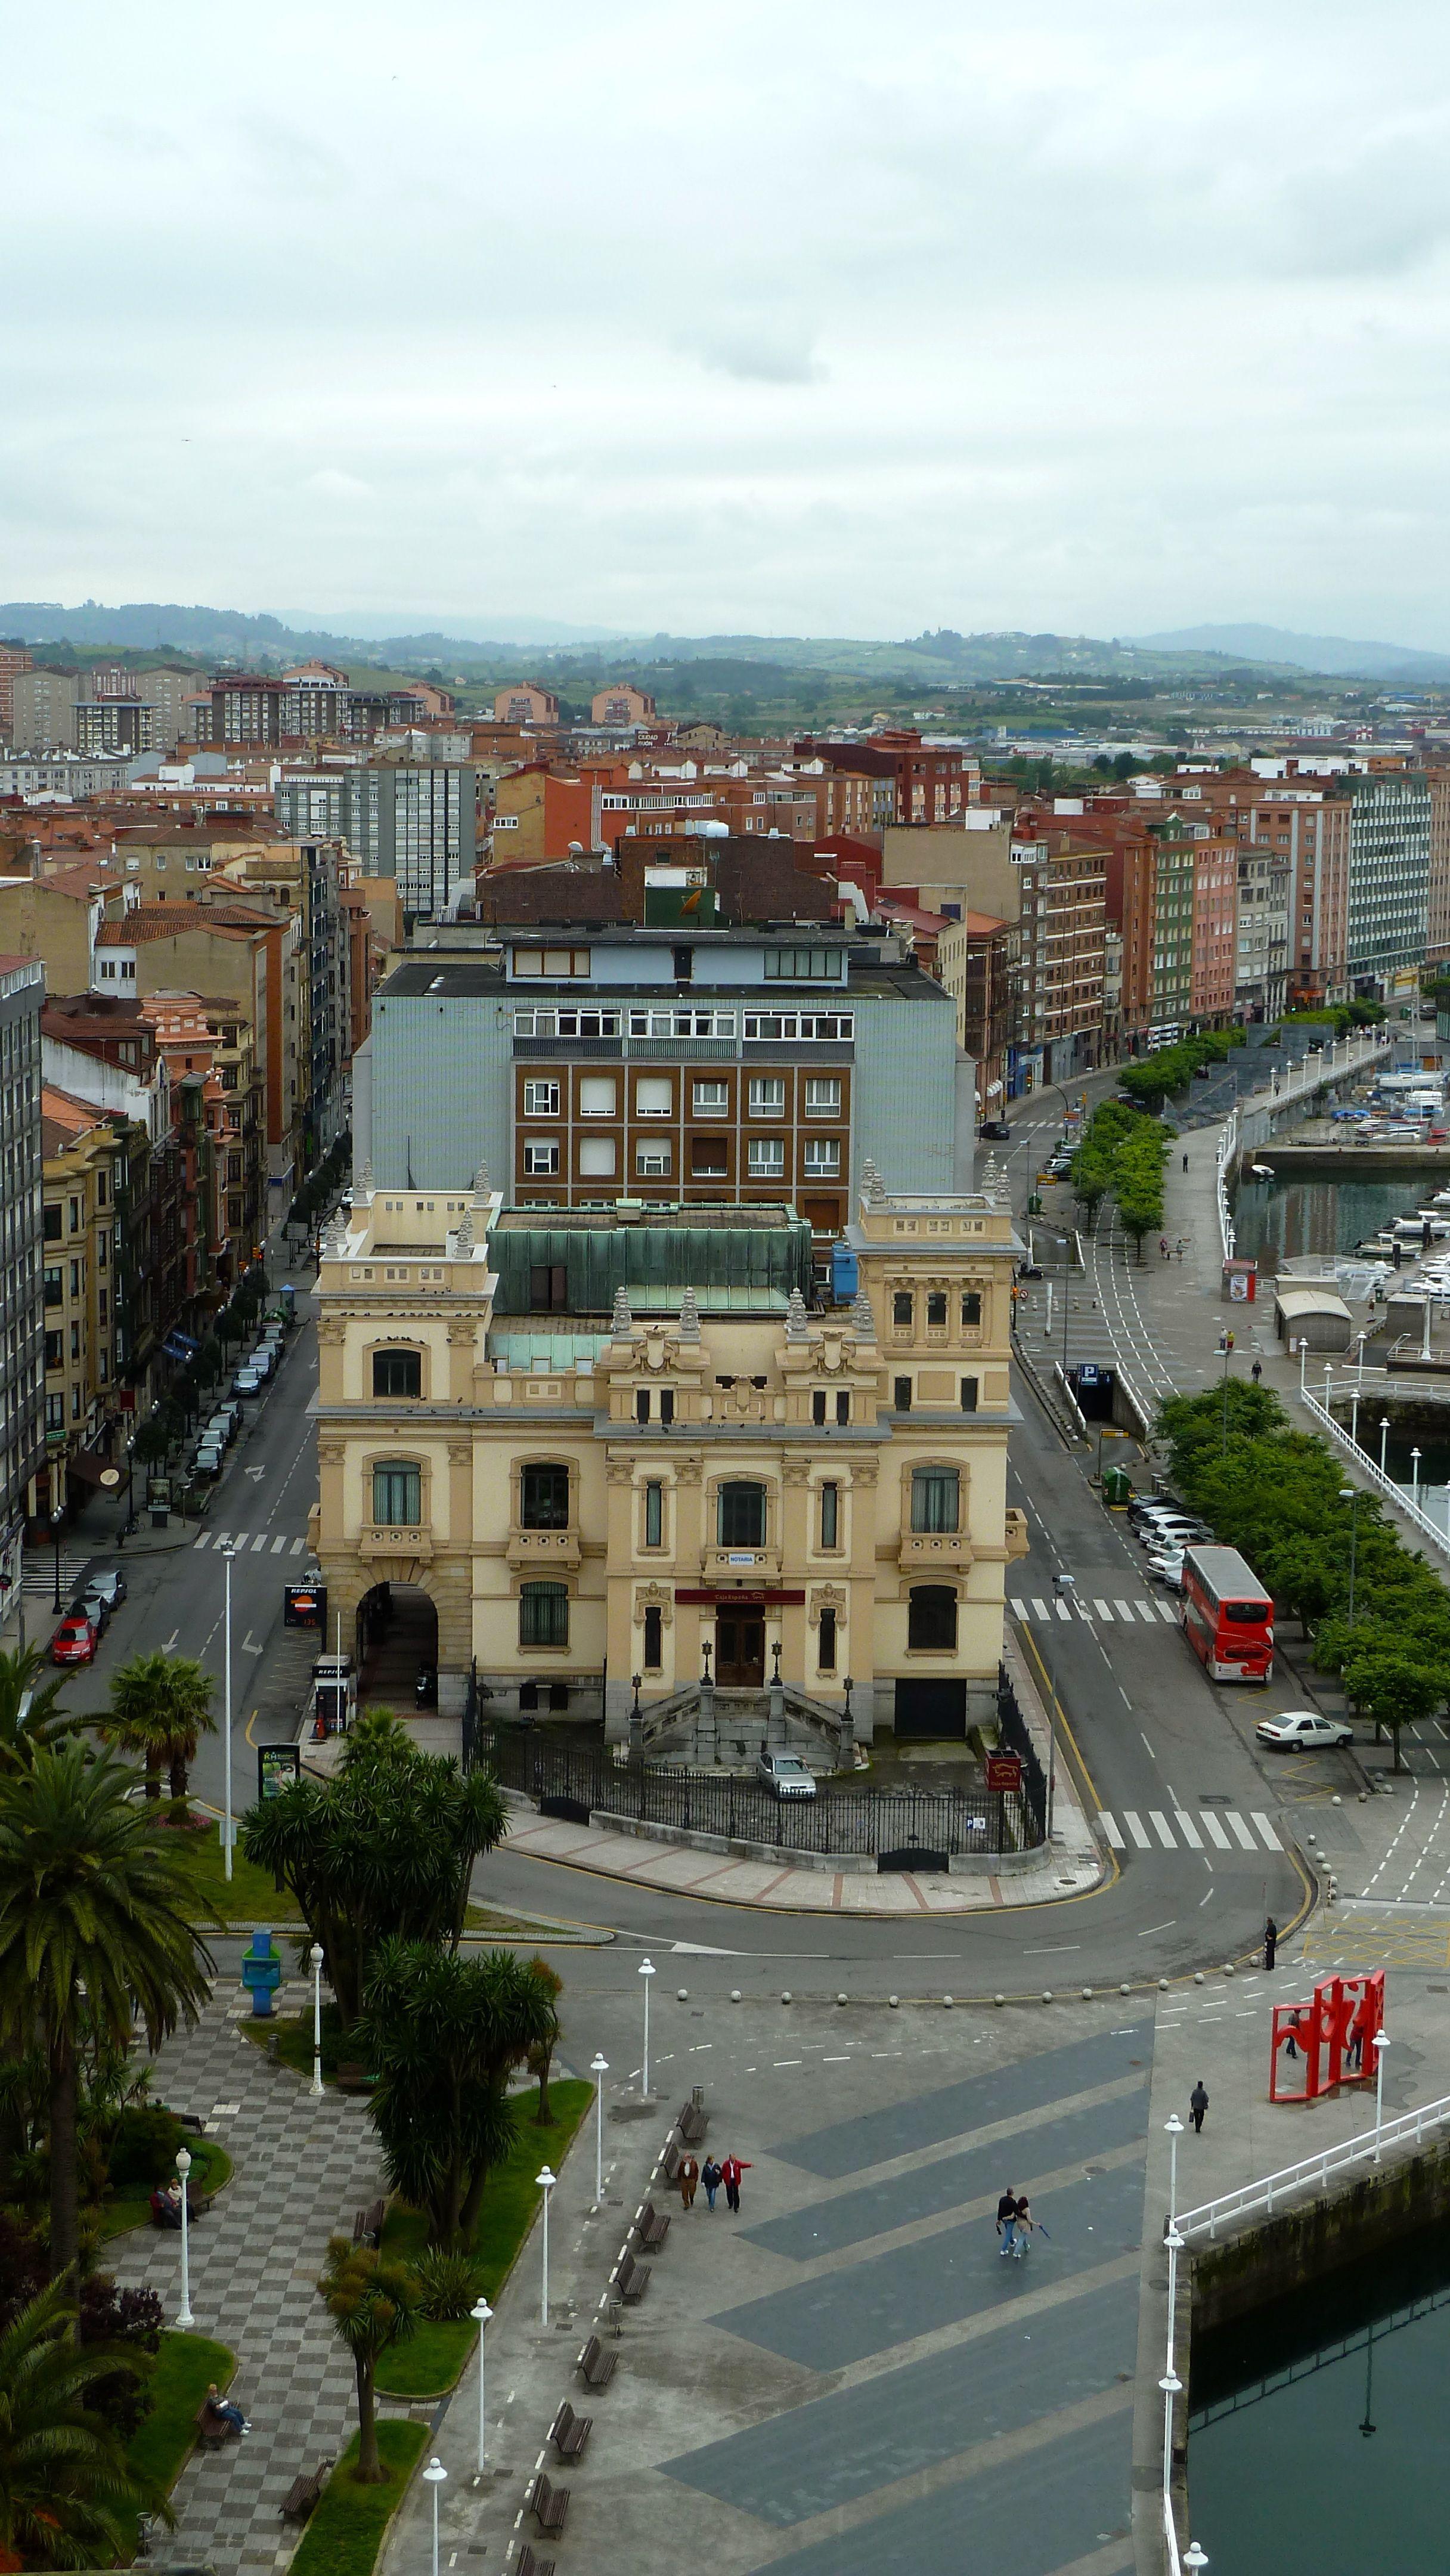 Jardines de la reina y banco urquijo en gij n asturias pinterest asturias espa a espa a - Jardines de la reina ...